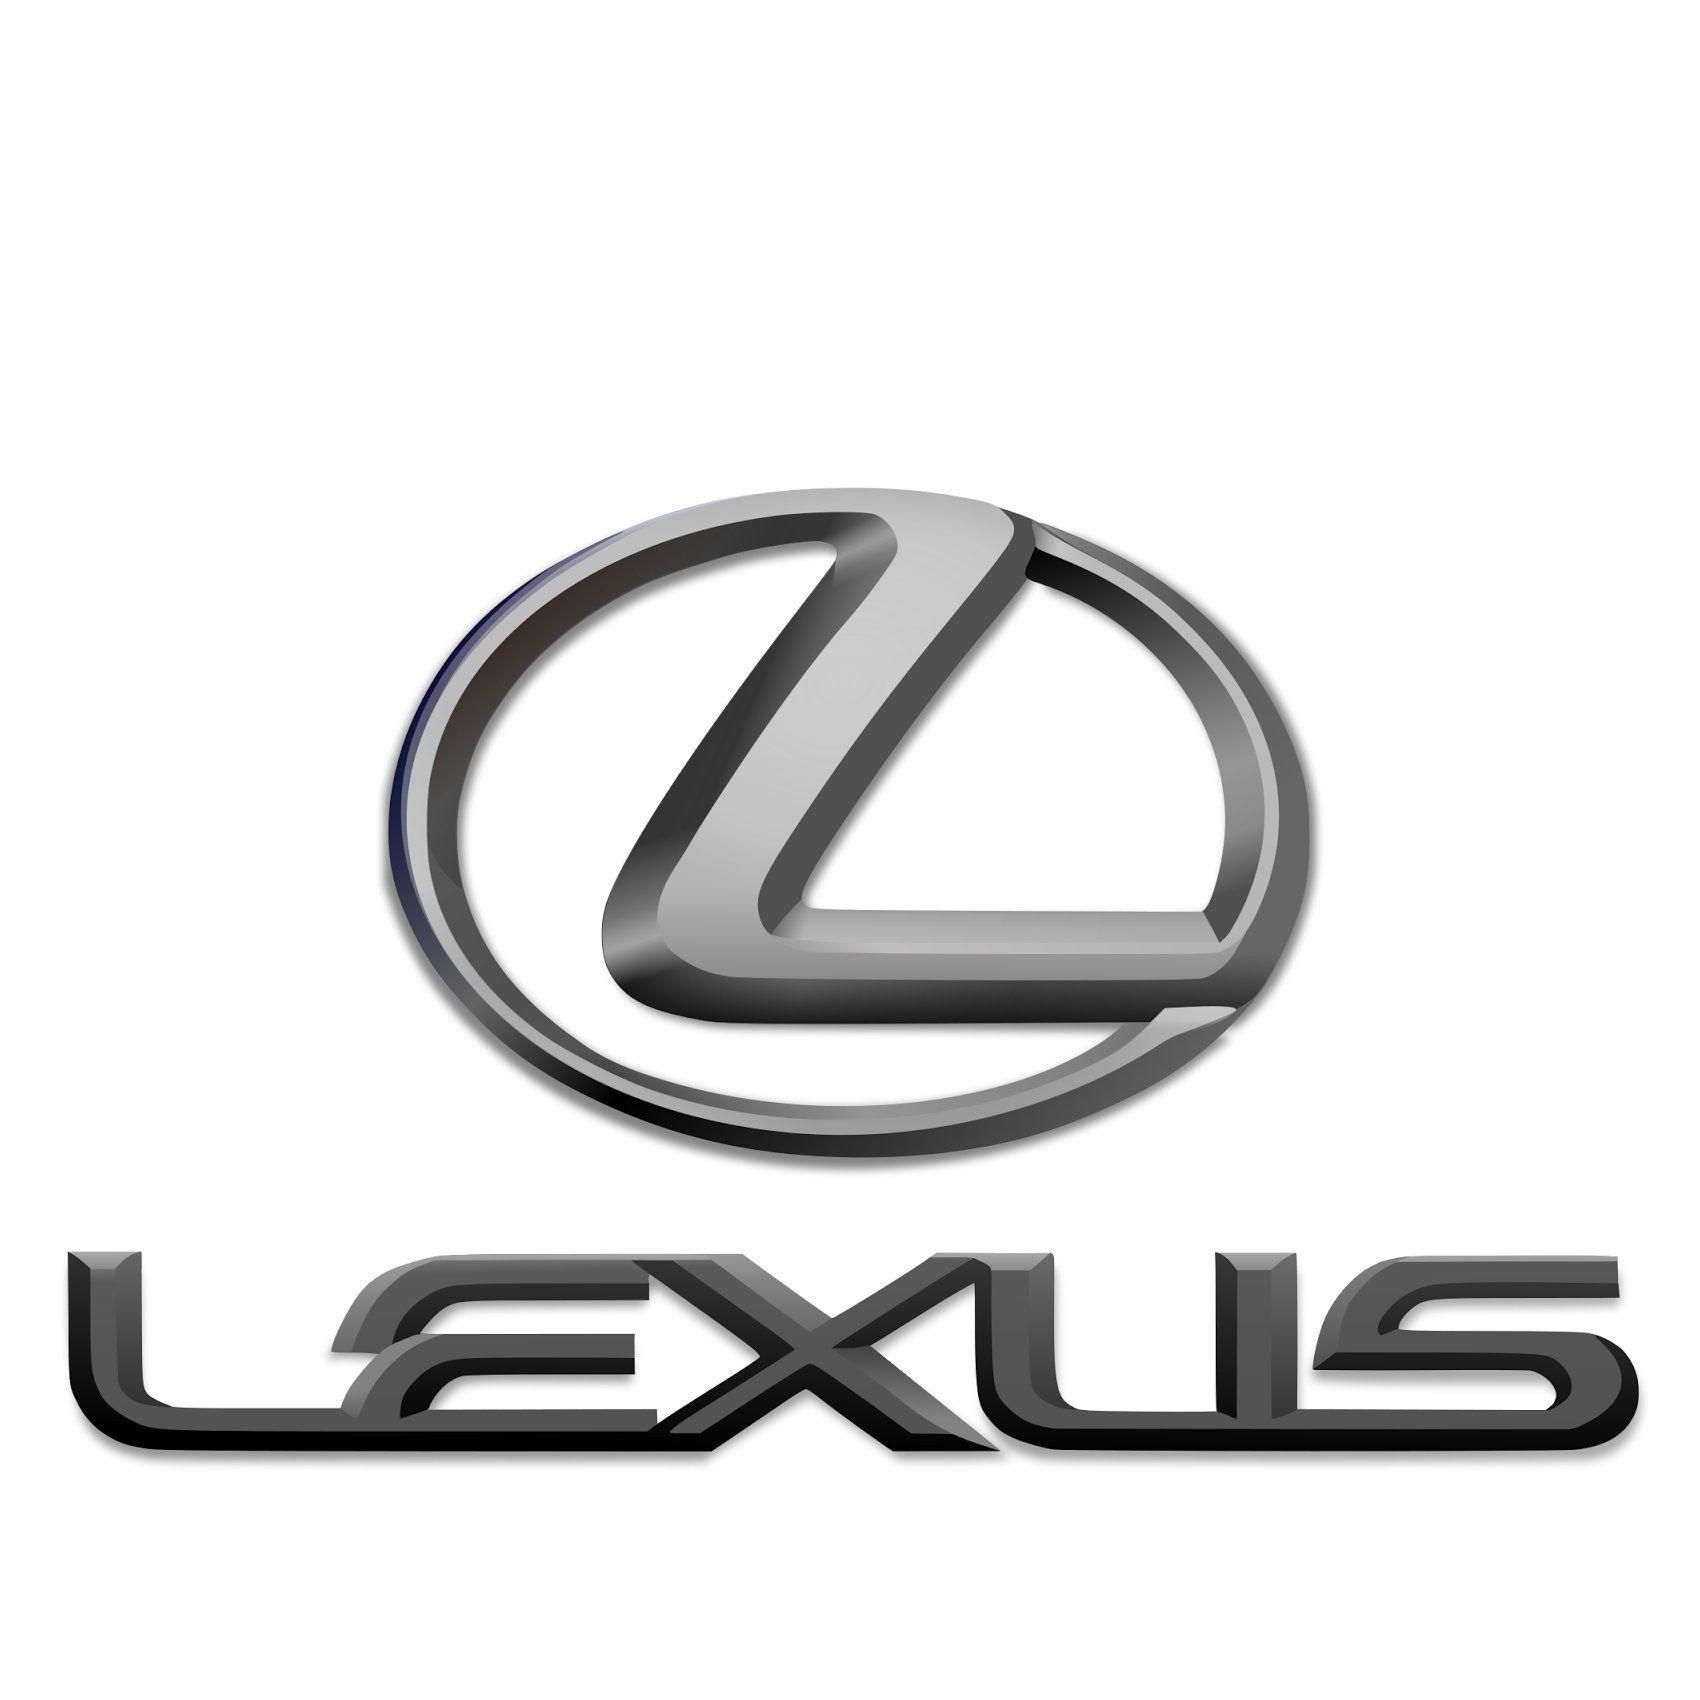 Lexus HD Logo - Sports Car Pictures Gallery | Lexus logo, Car logos, Lexus  cars